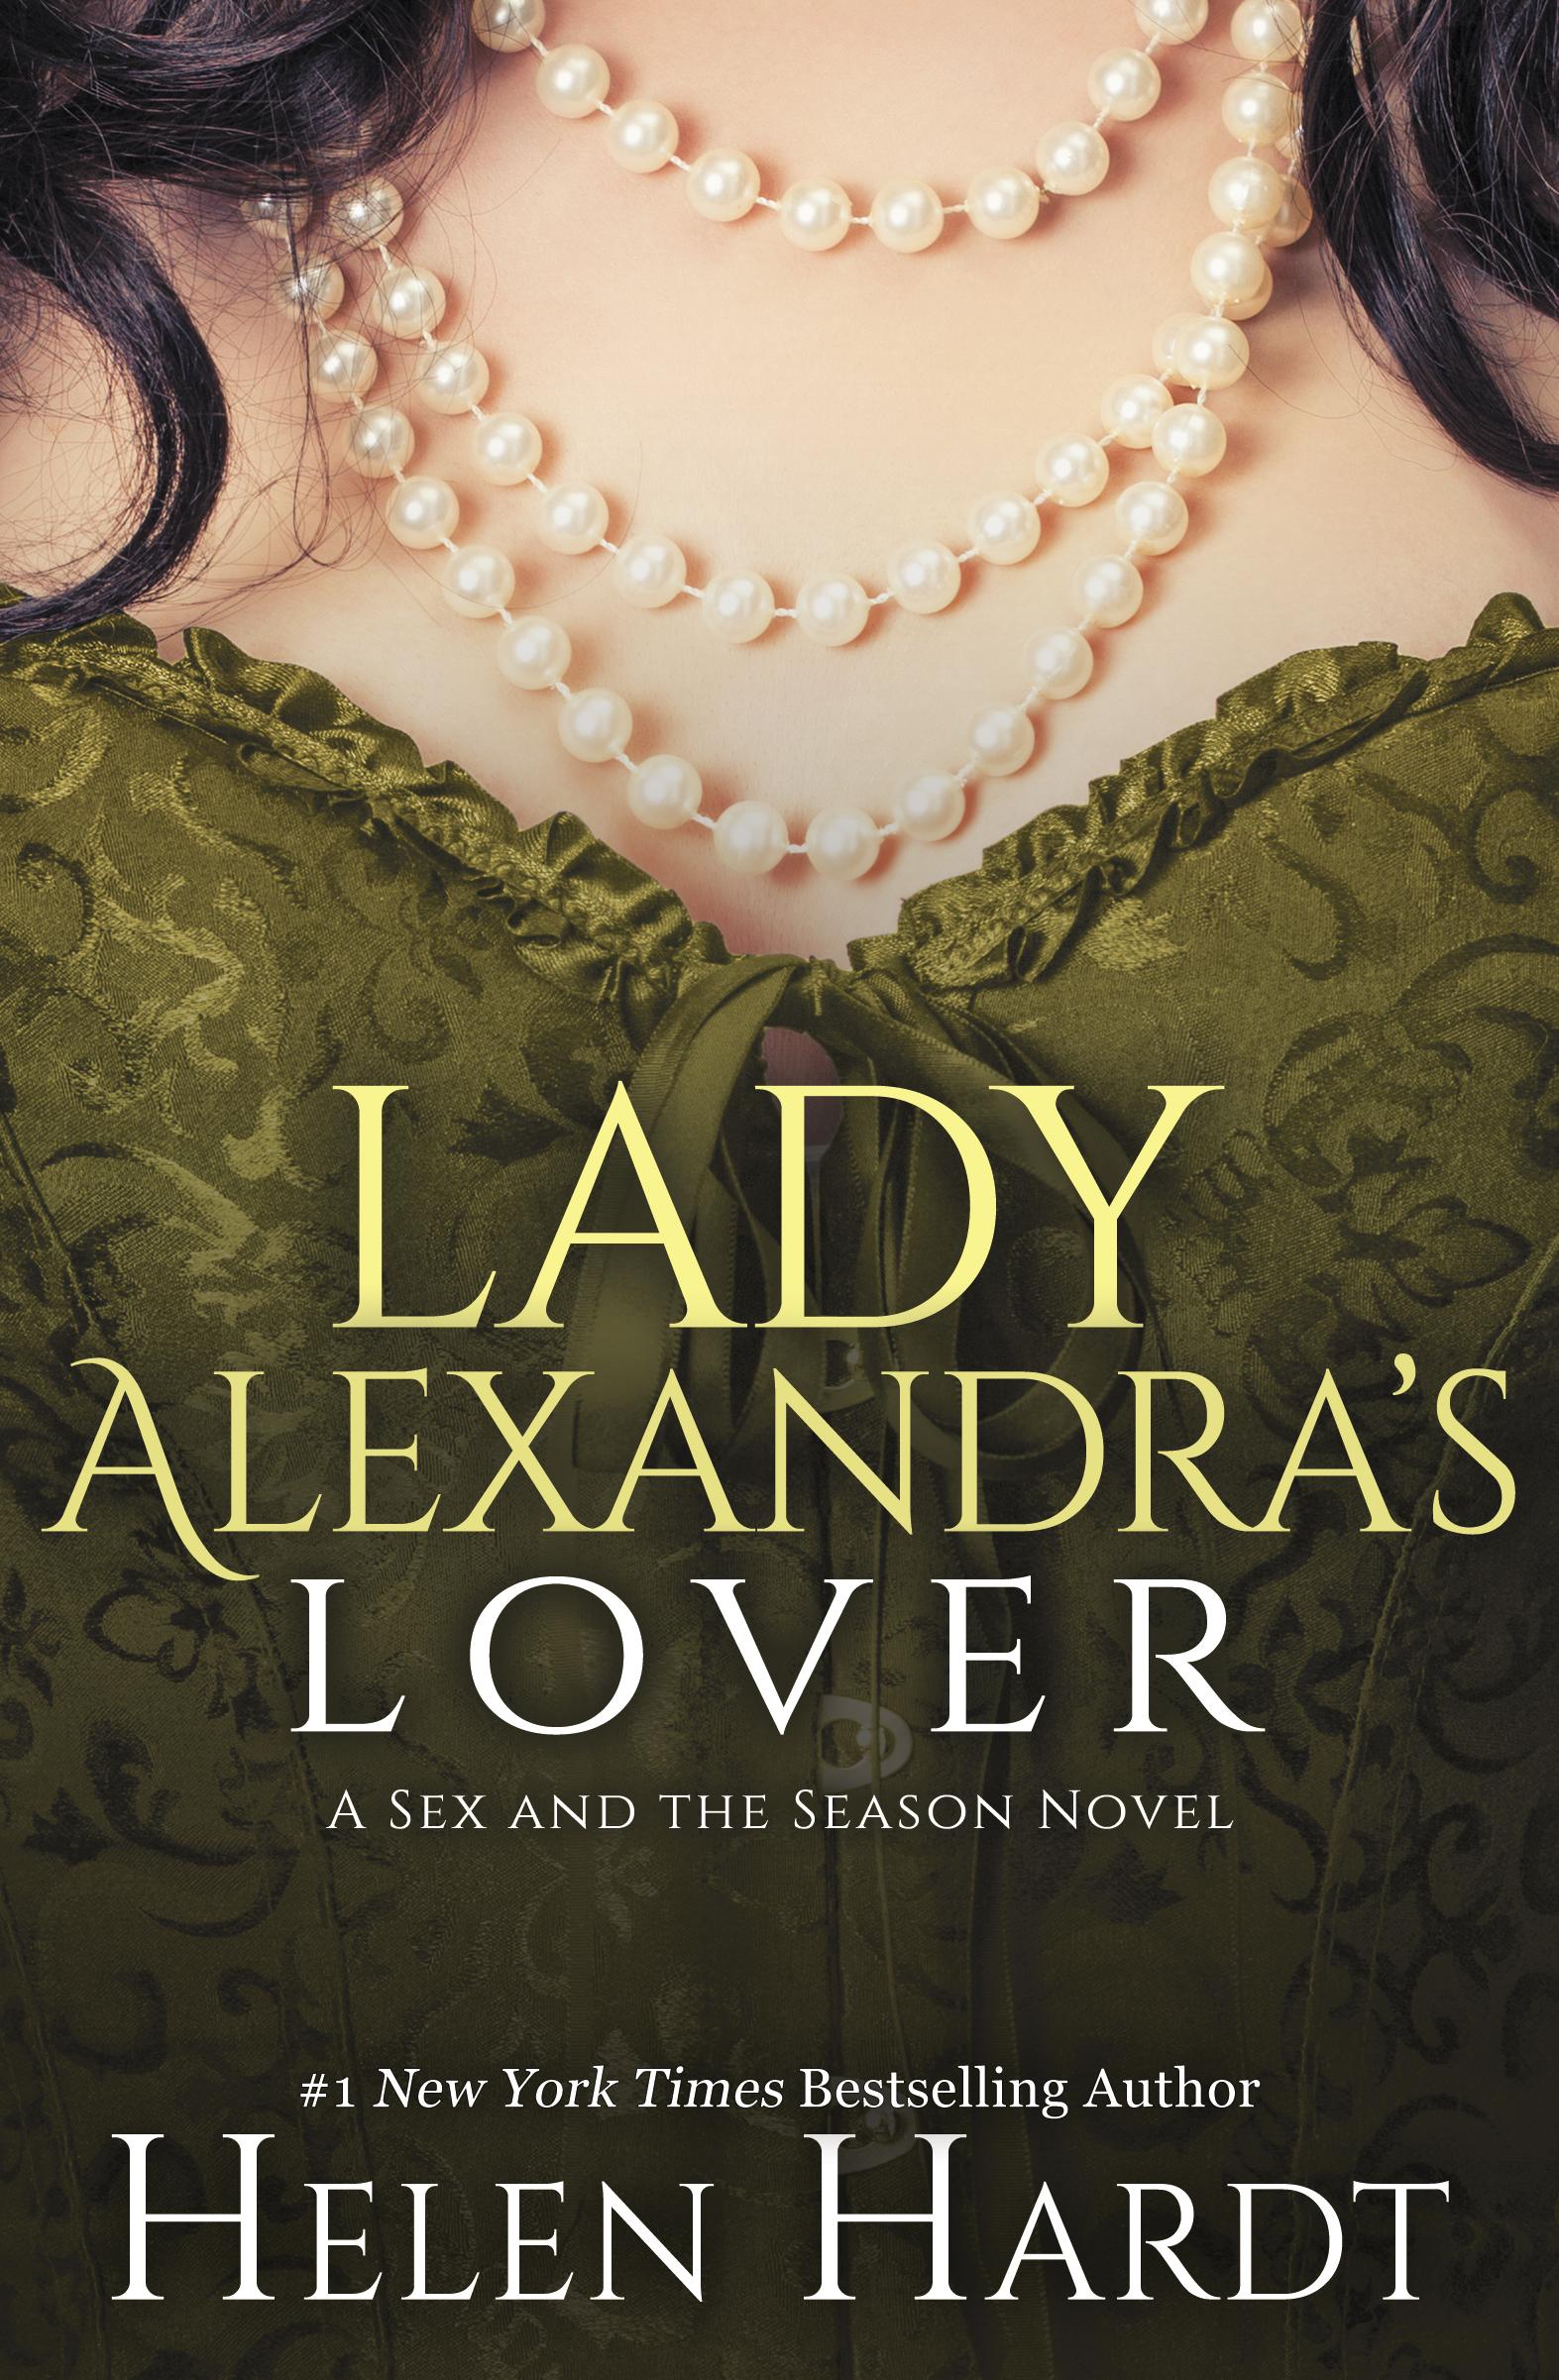 Lady Alexandra's Lover - Helen Hardt